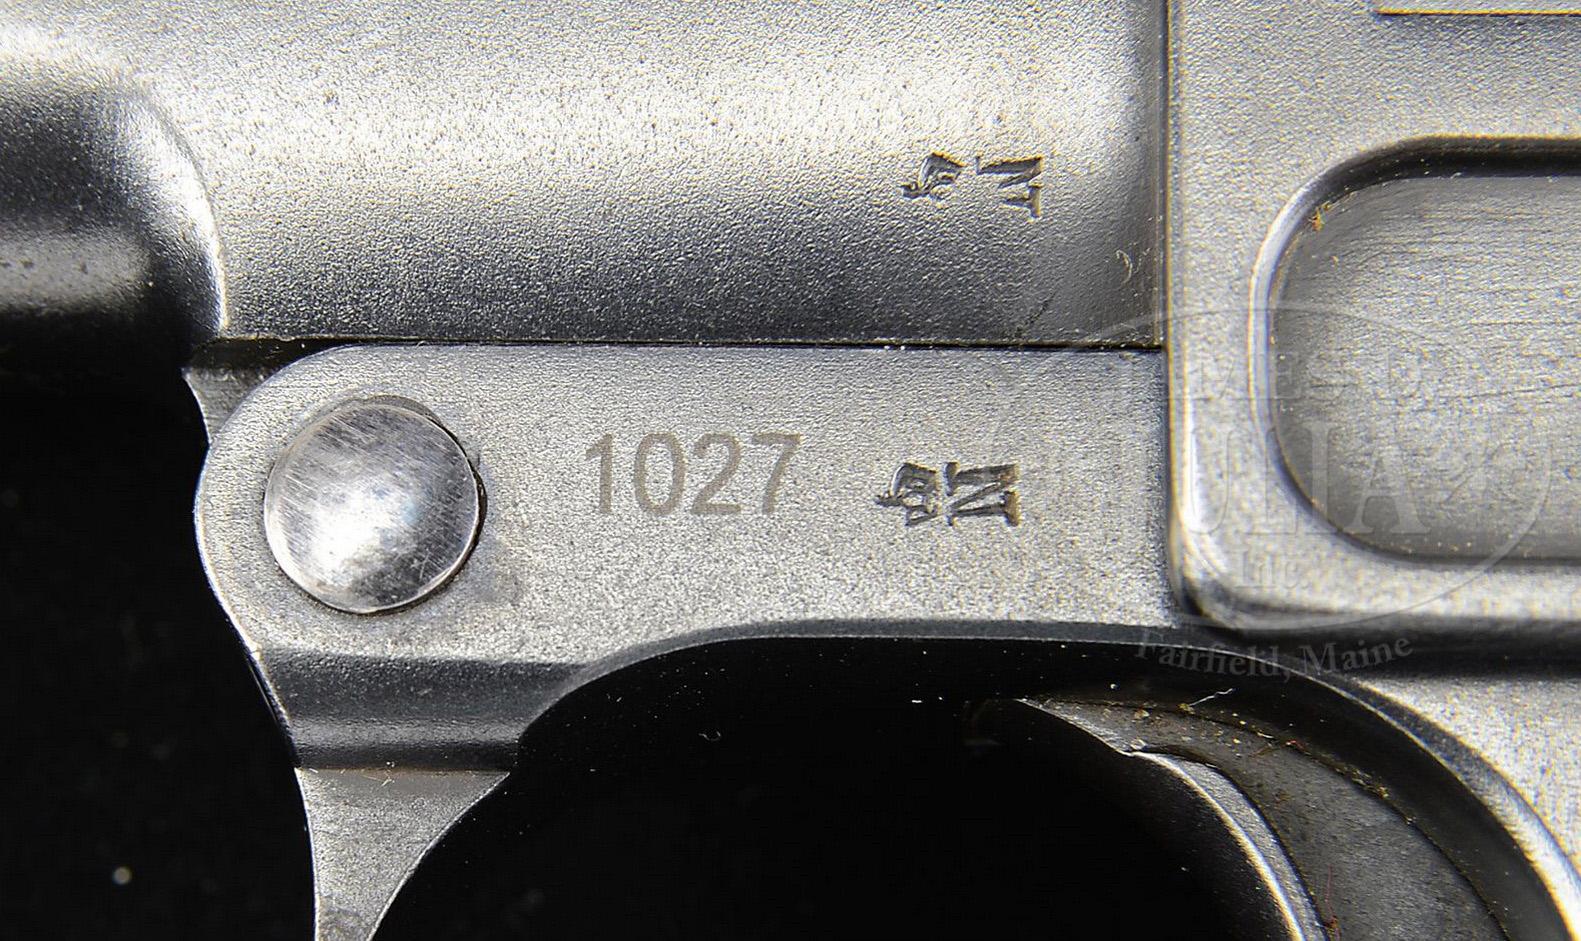 Dreyse 9mm pistol Model 1910